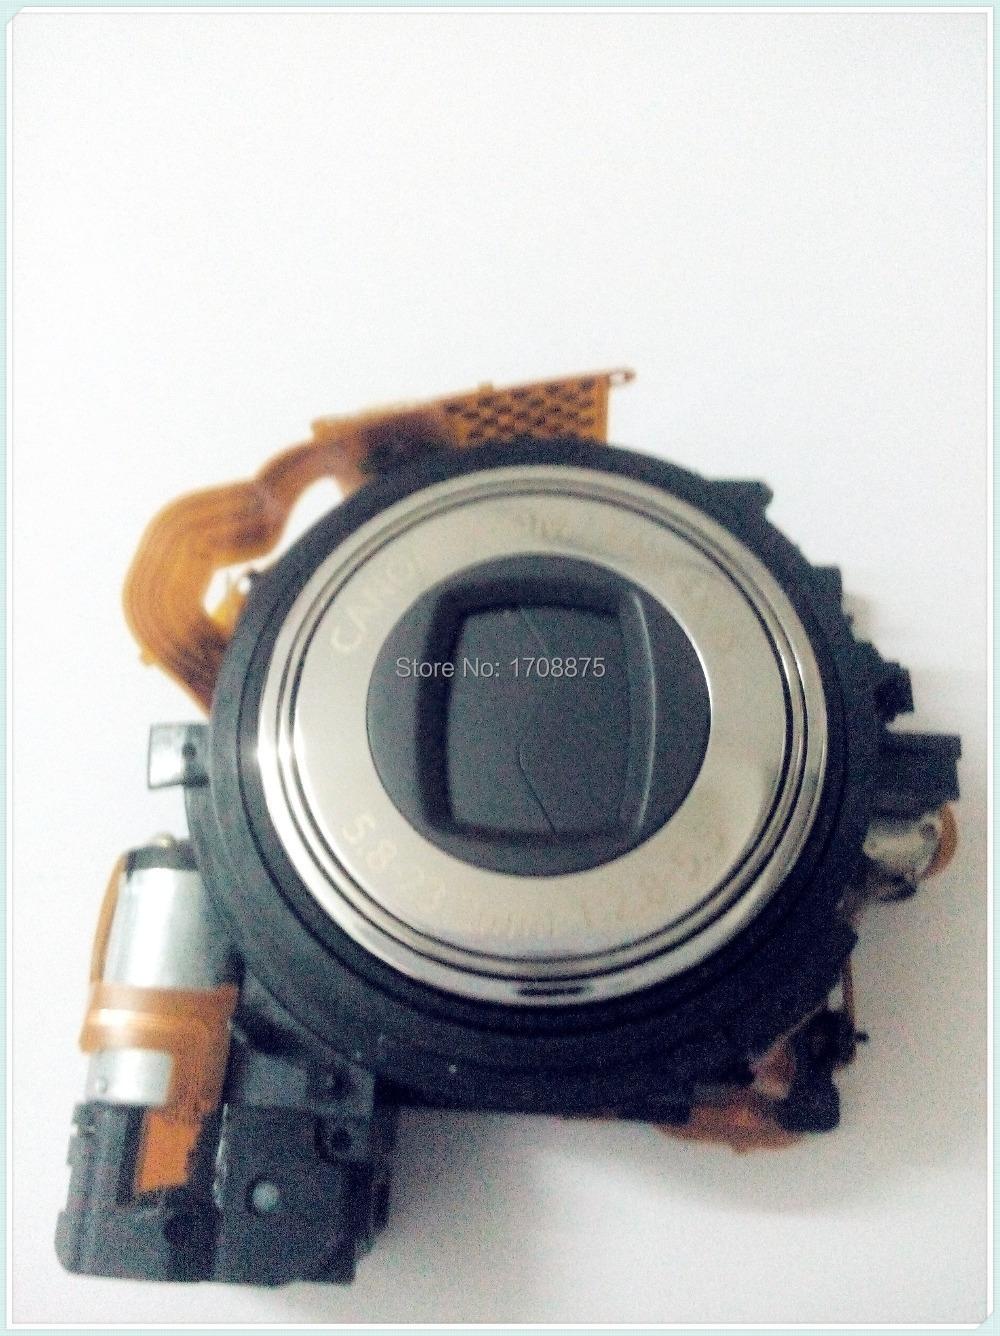 95%NEW Lens Zoom Unit For CANON PowerShot IXUS800 IXUS950 SD700 SD850 Digital Camera Repair Part NO CCD(China (Mainland))